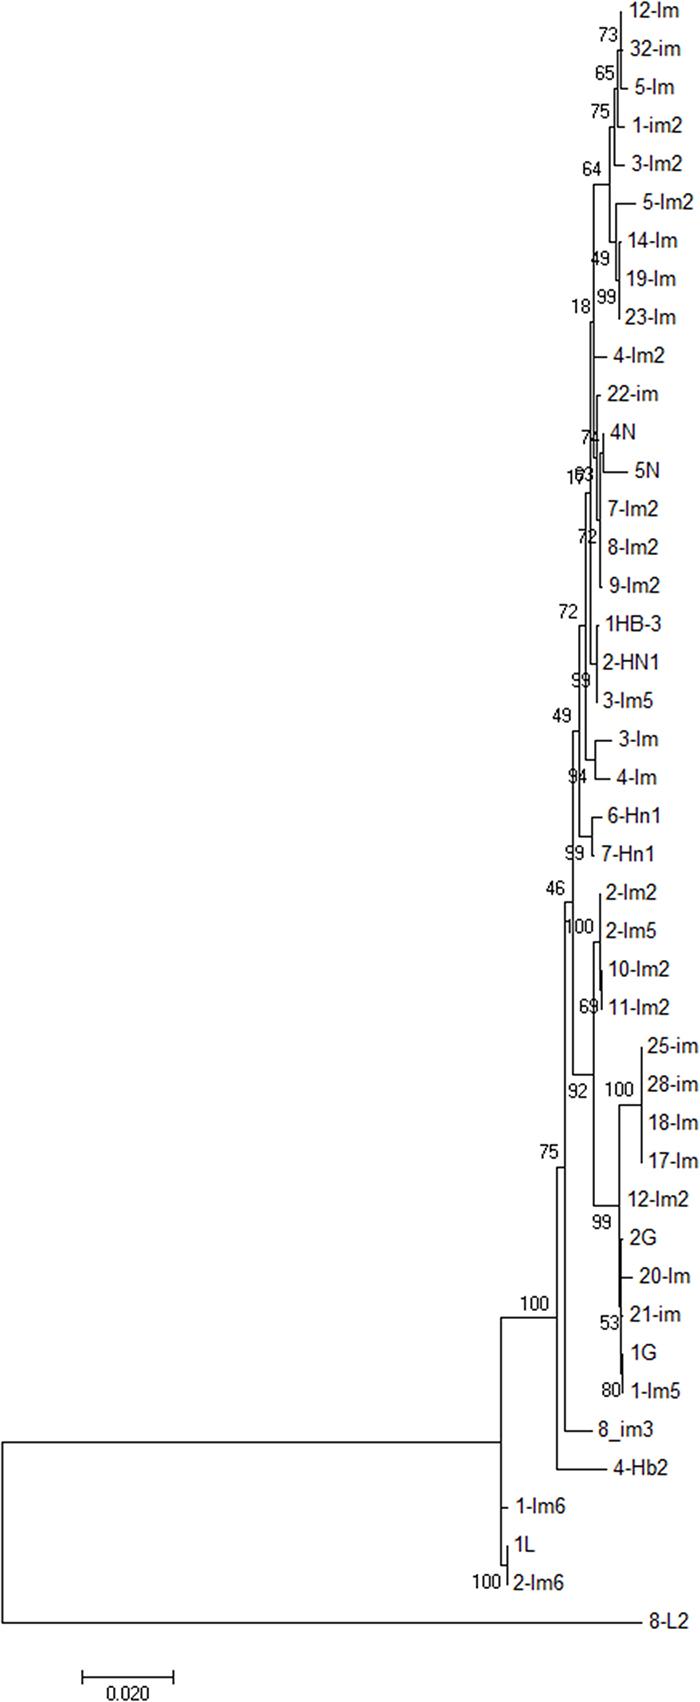 Phylogenetic analysis ESBL-producing E. coli isolates (n = 43) from bovine mastitis.